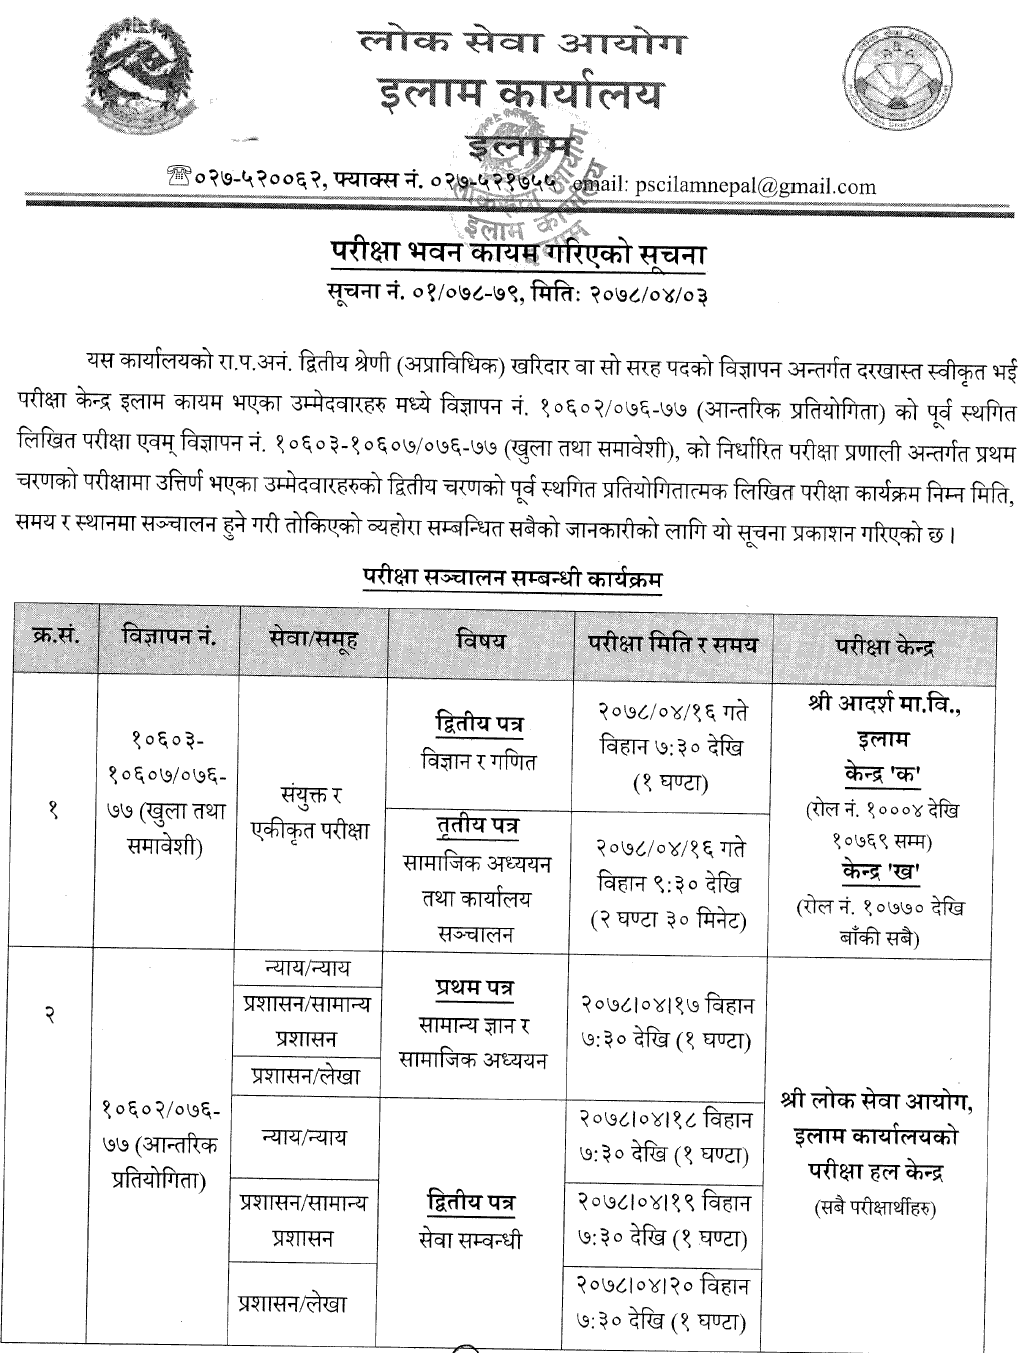 9) Lok Sewa Aayog Illam (Kharidar Second Phase Written Exam Center)